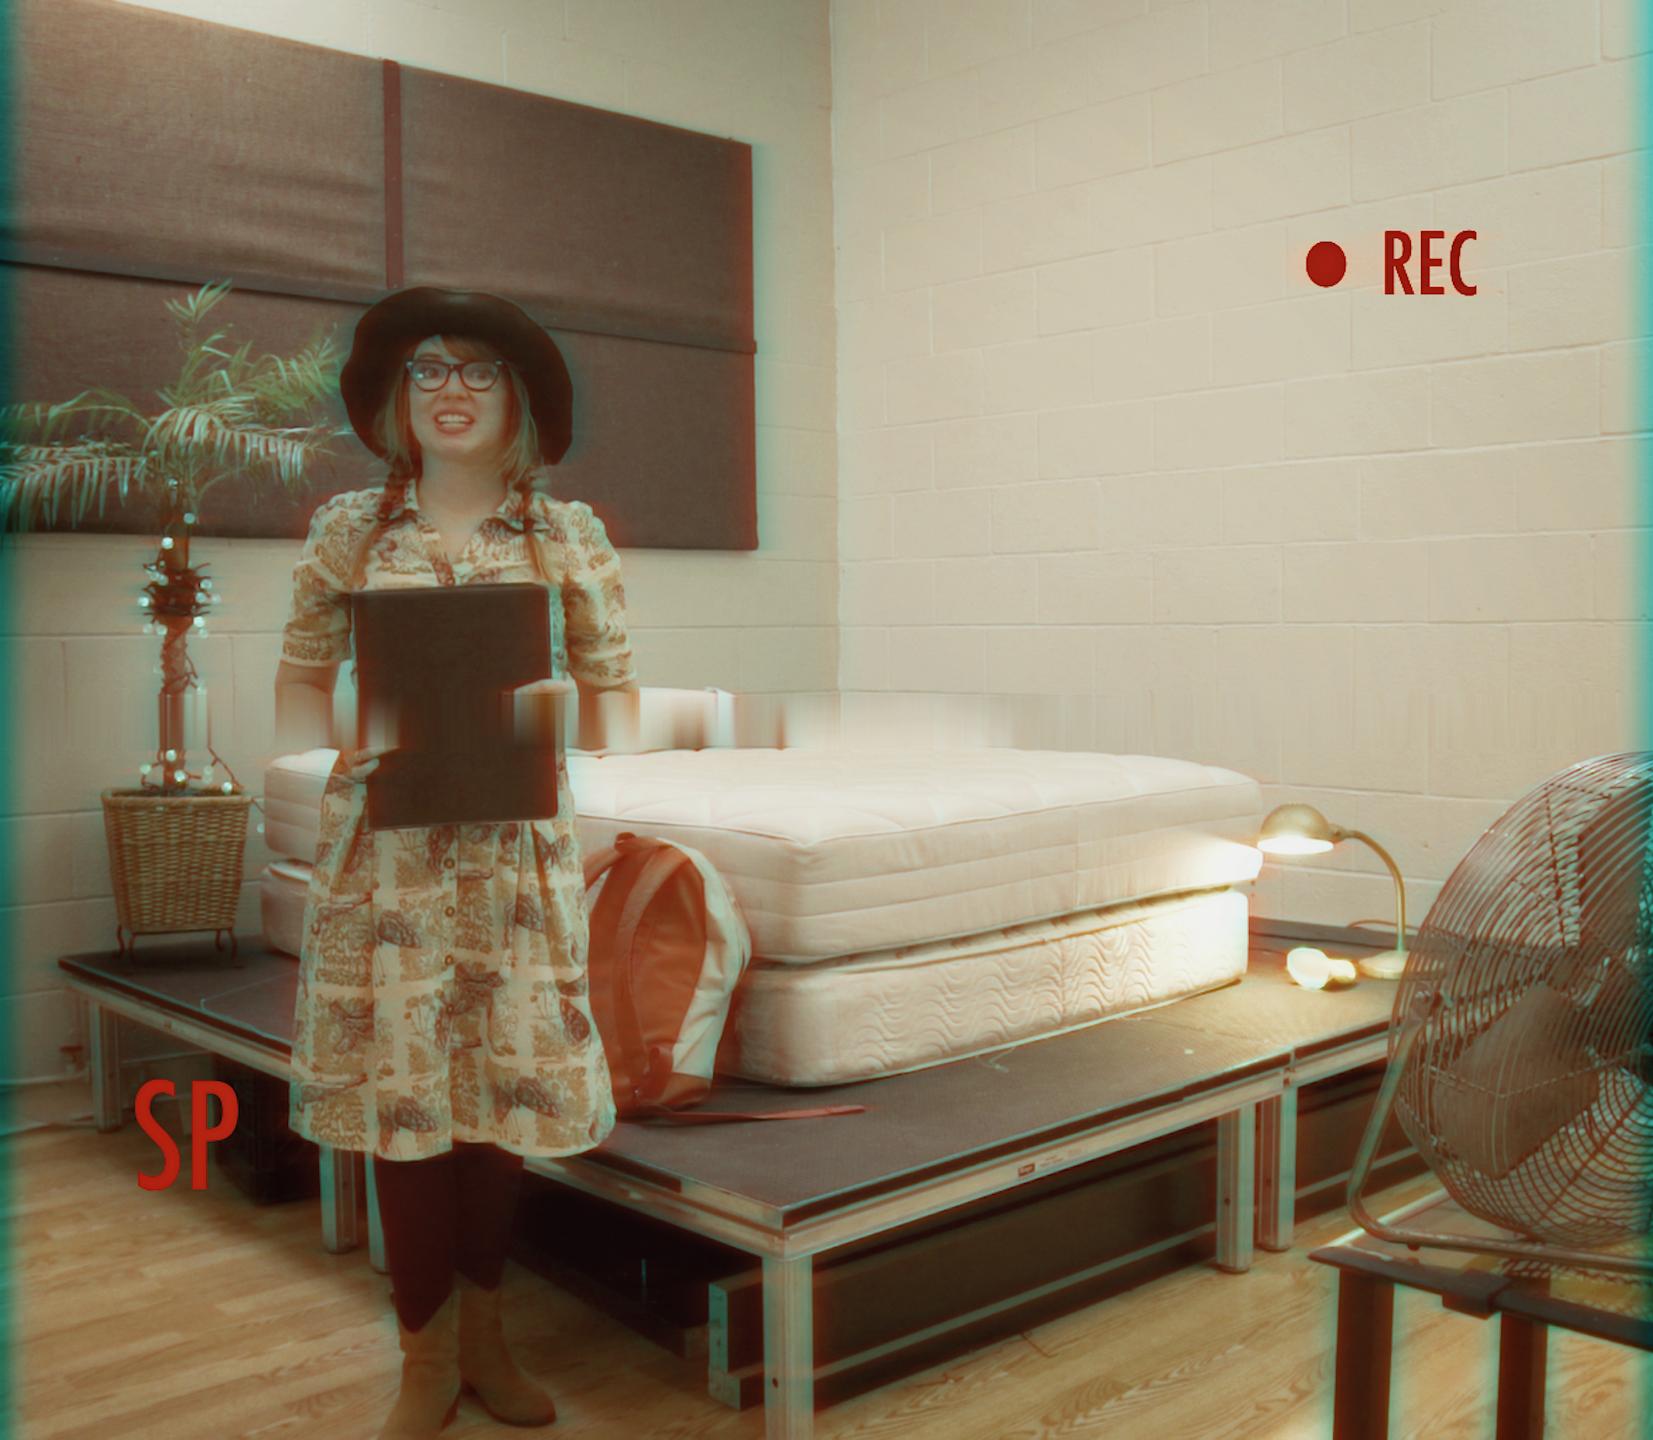 Janice (Natalie Palamides) slates for an awkward audition.